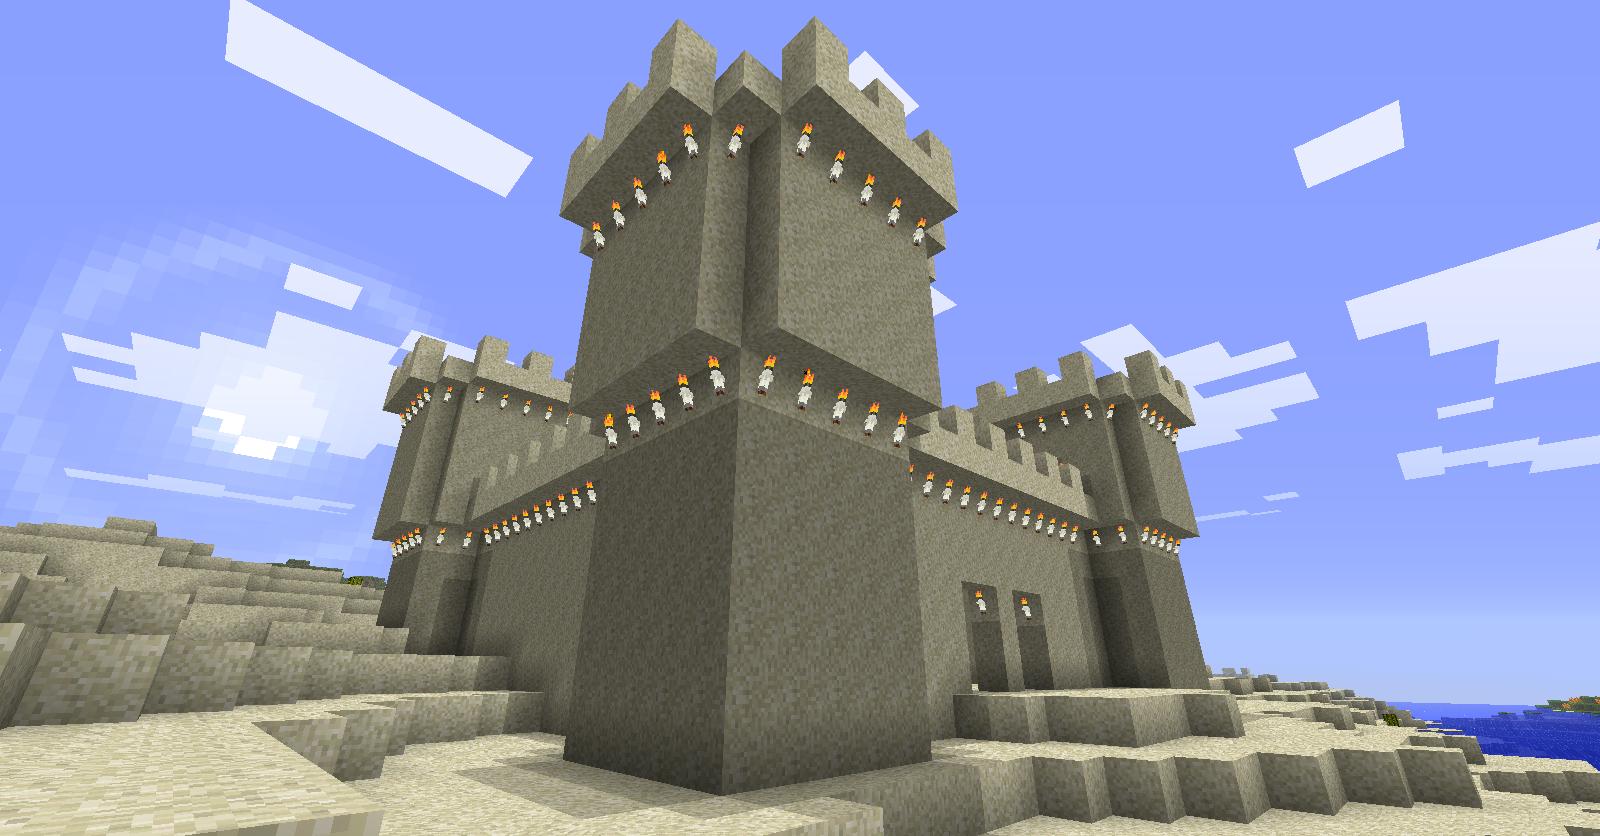 minecraft sand castle blueprints - Google Search   Build-Projects